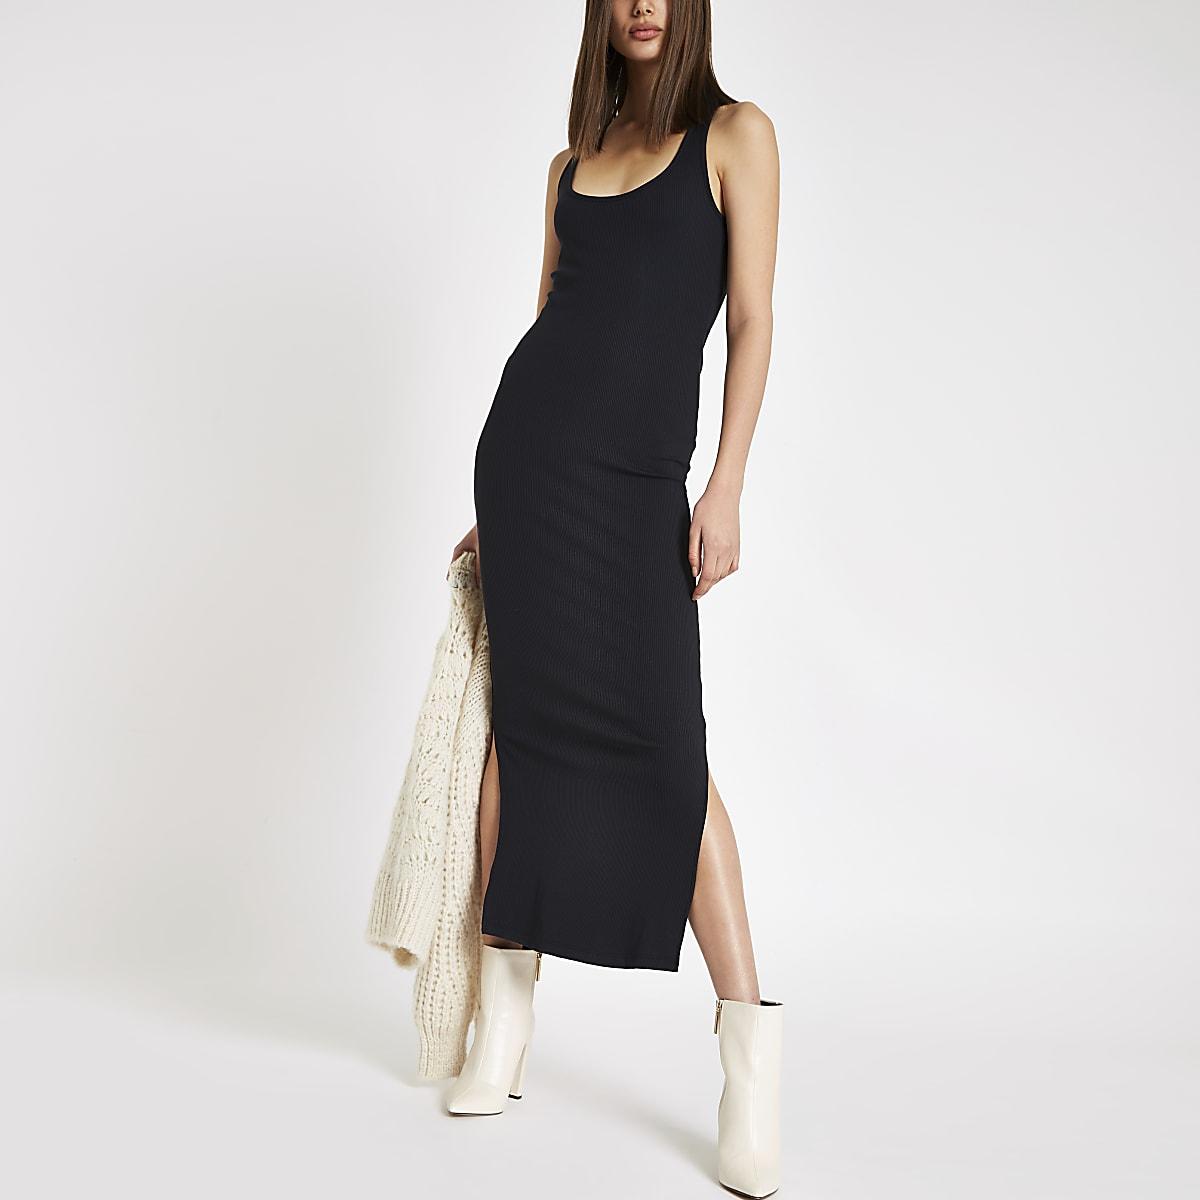 45941536c647 Black ribbed bodycon maxi dress - Maxi Dresses - Dresses - women